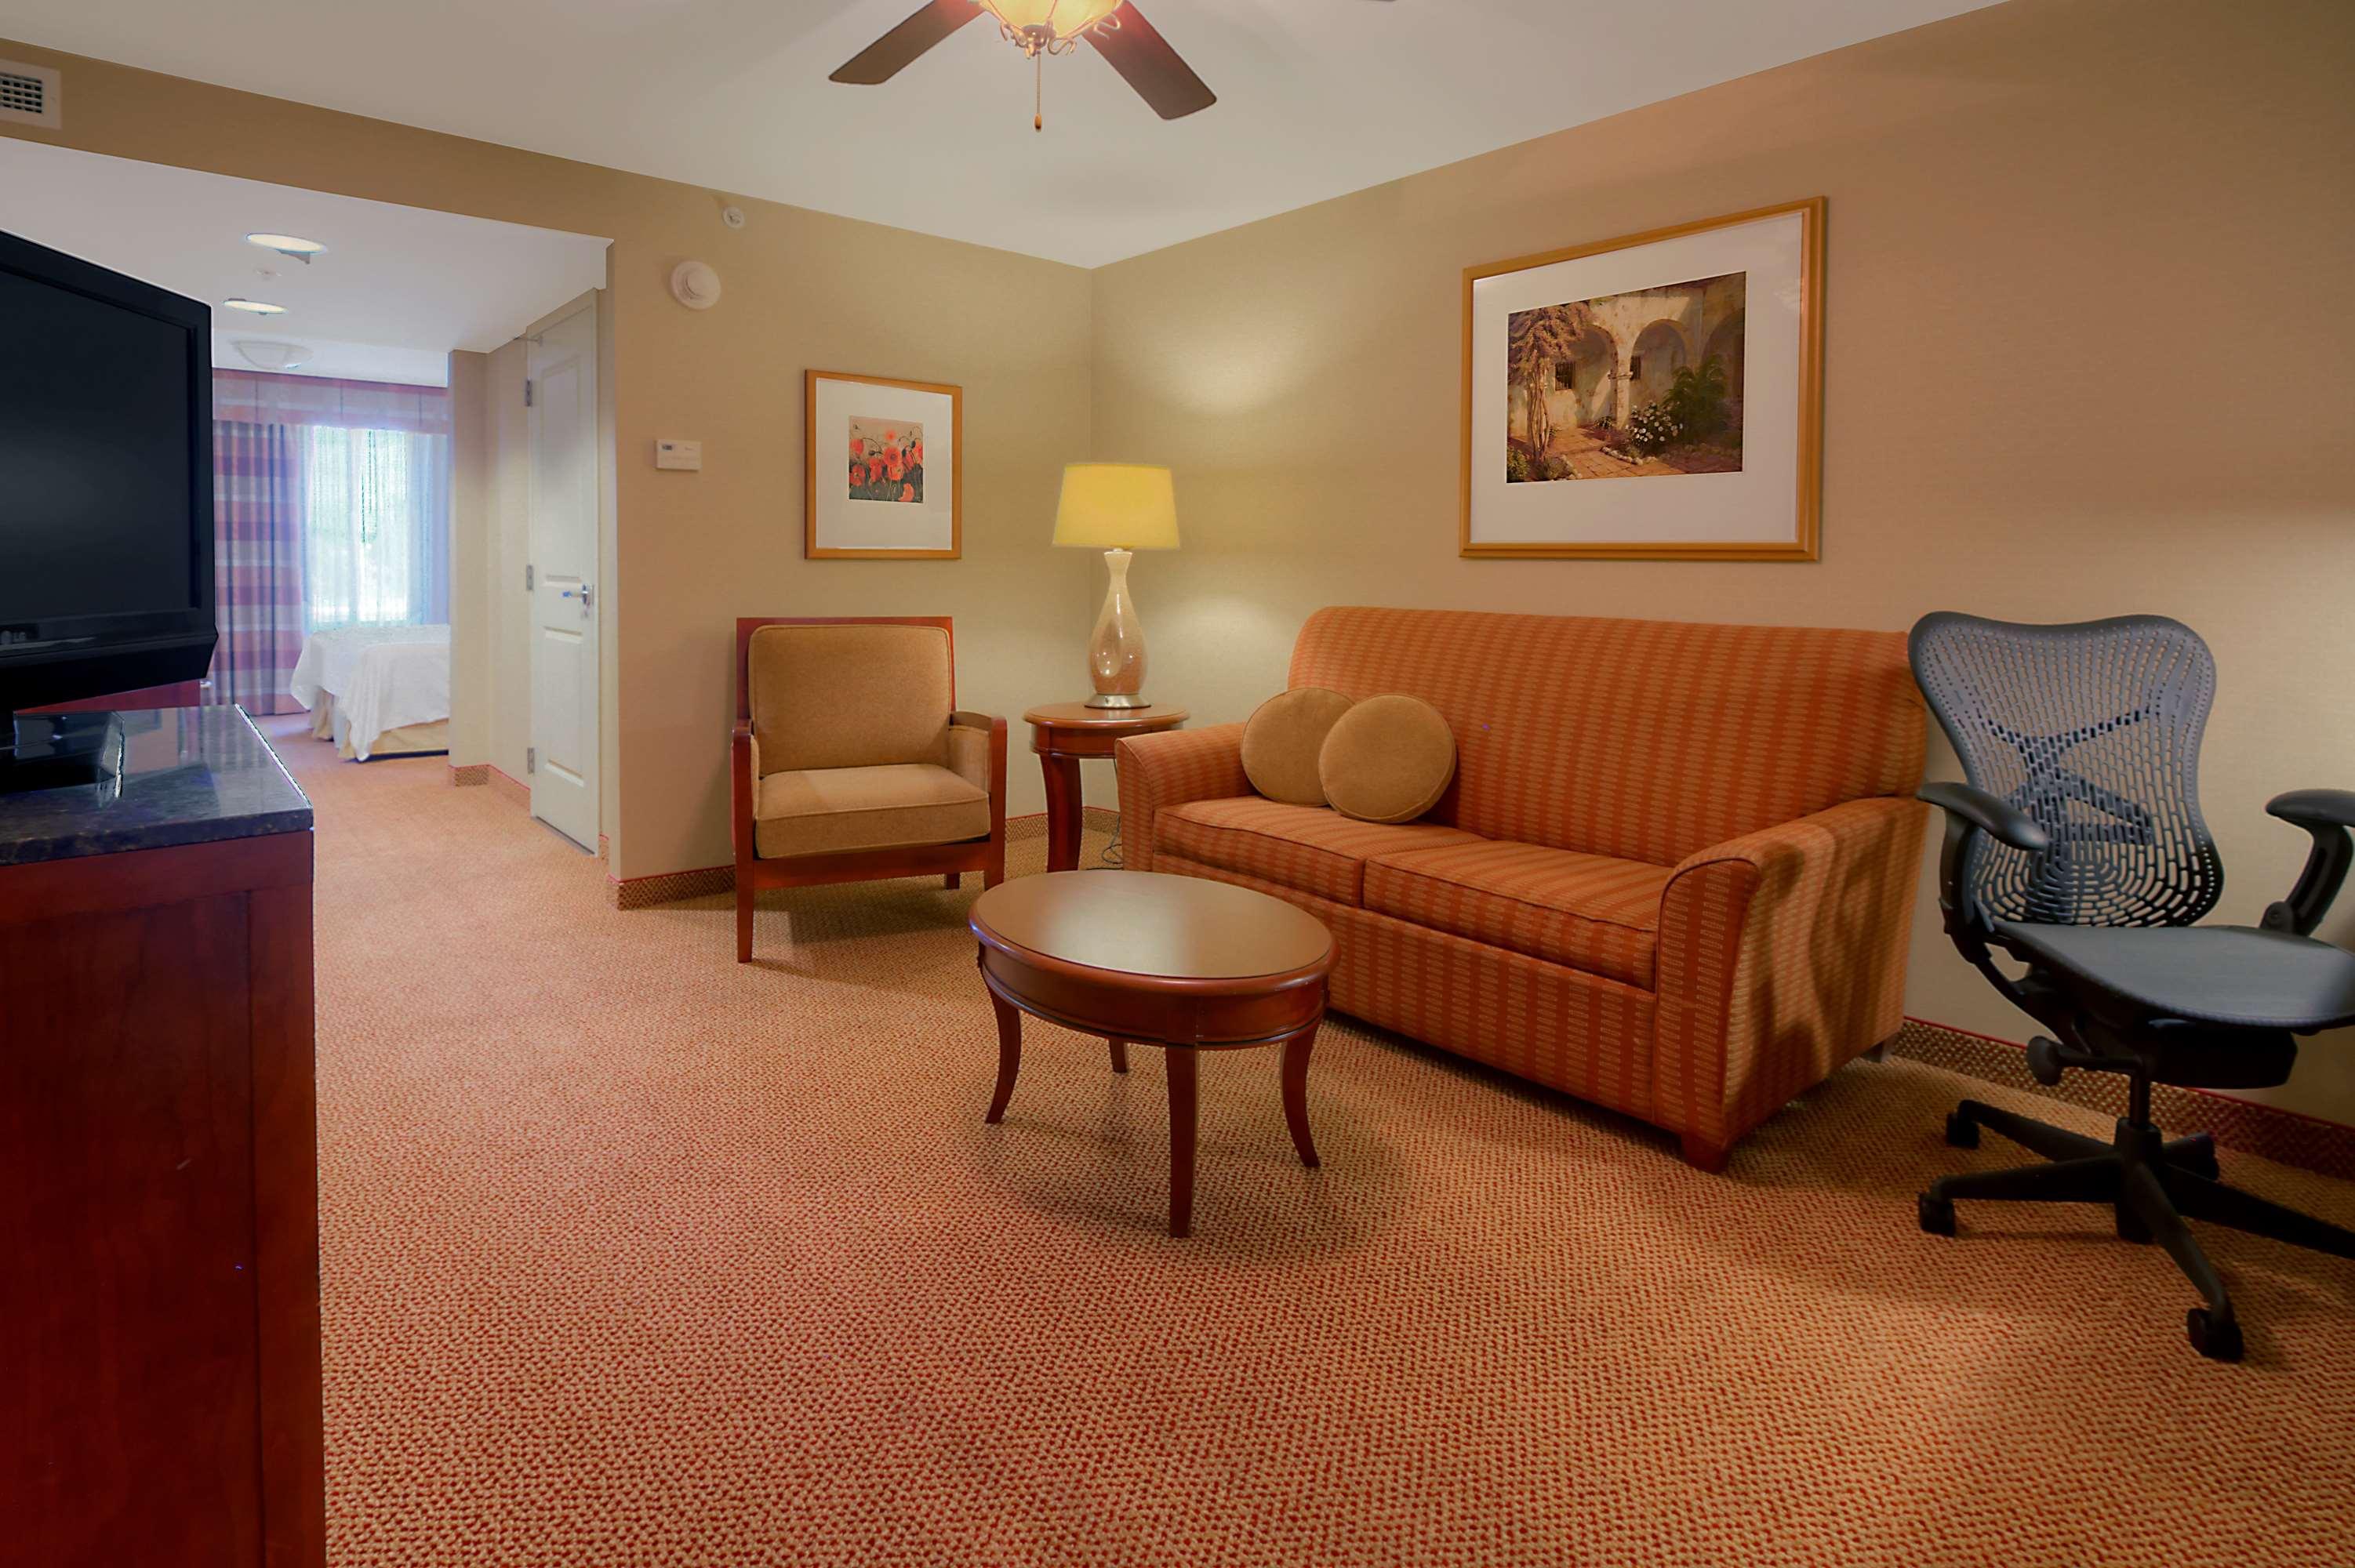 Hilton Garden Inn Great Falls image 15